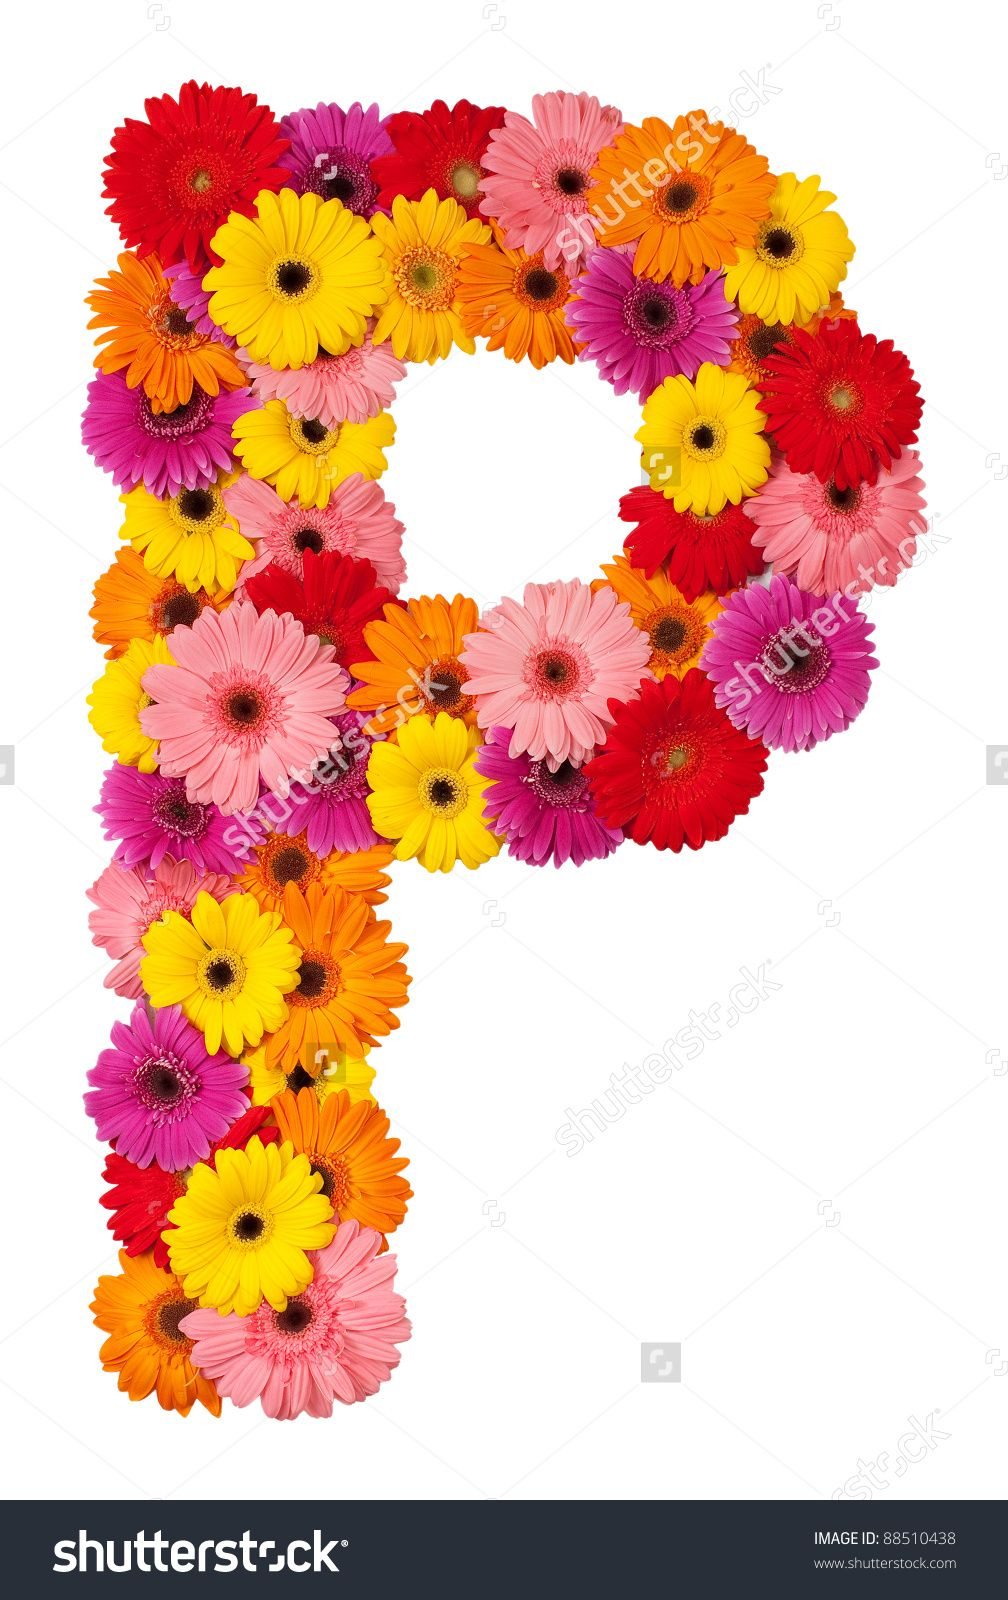 image result for letter p images p priyanka pinterest